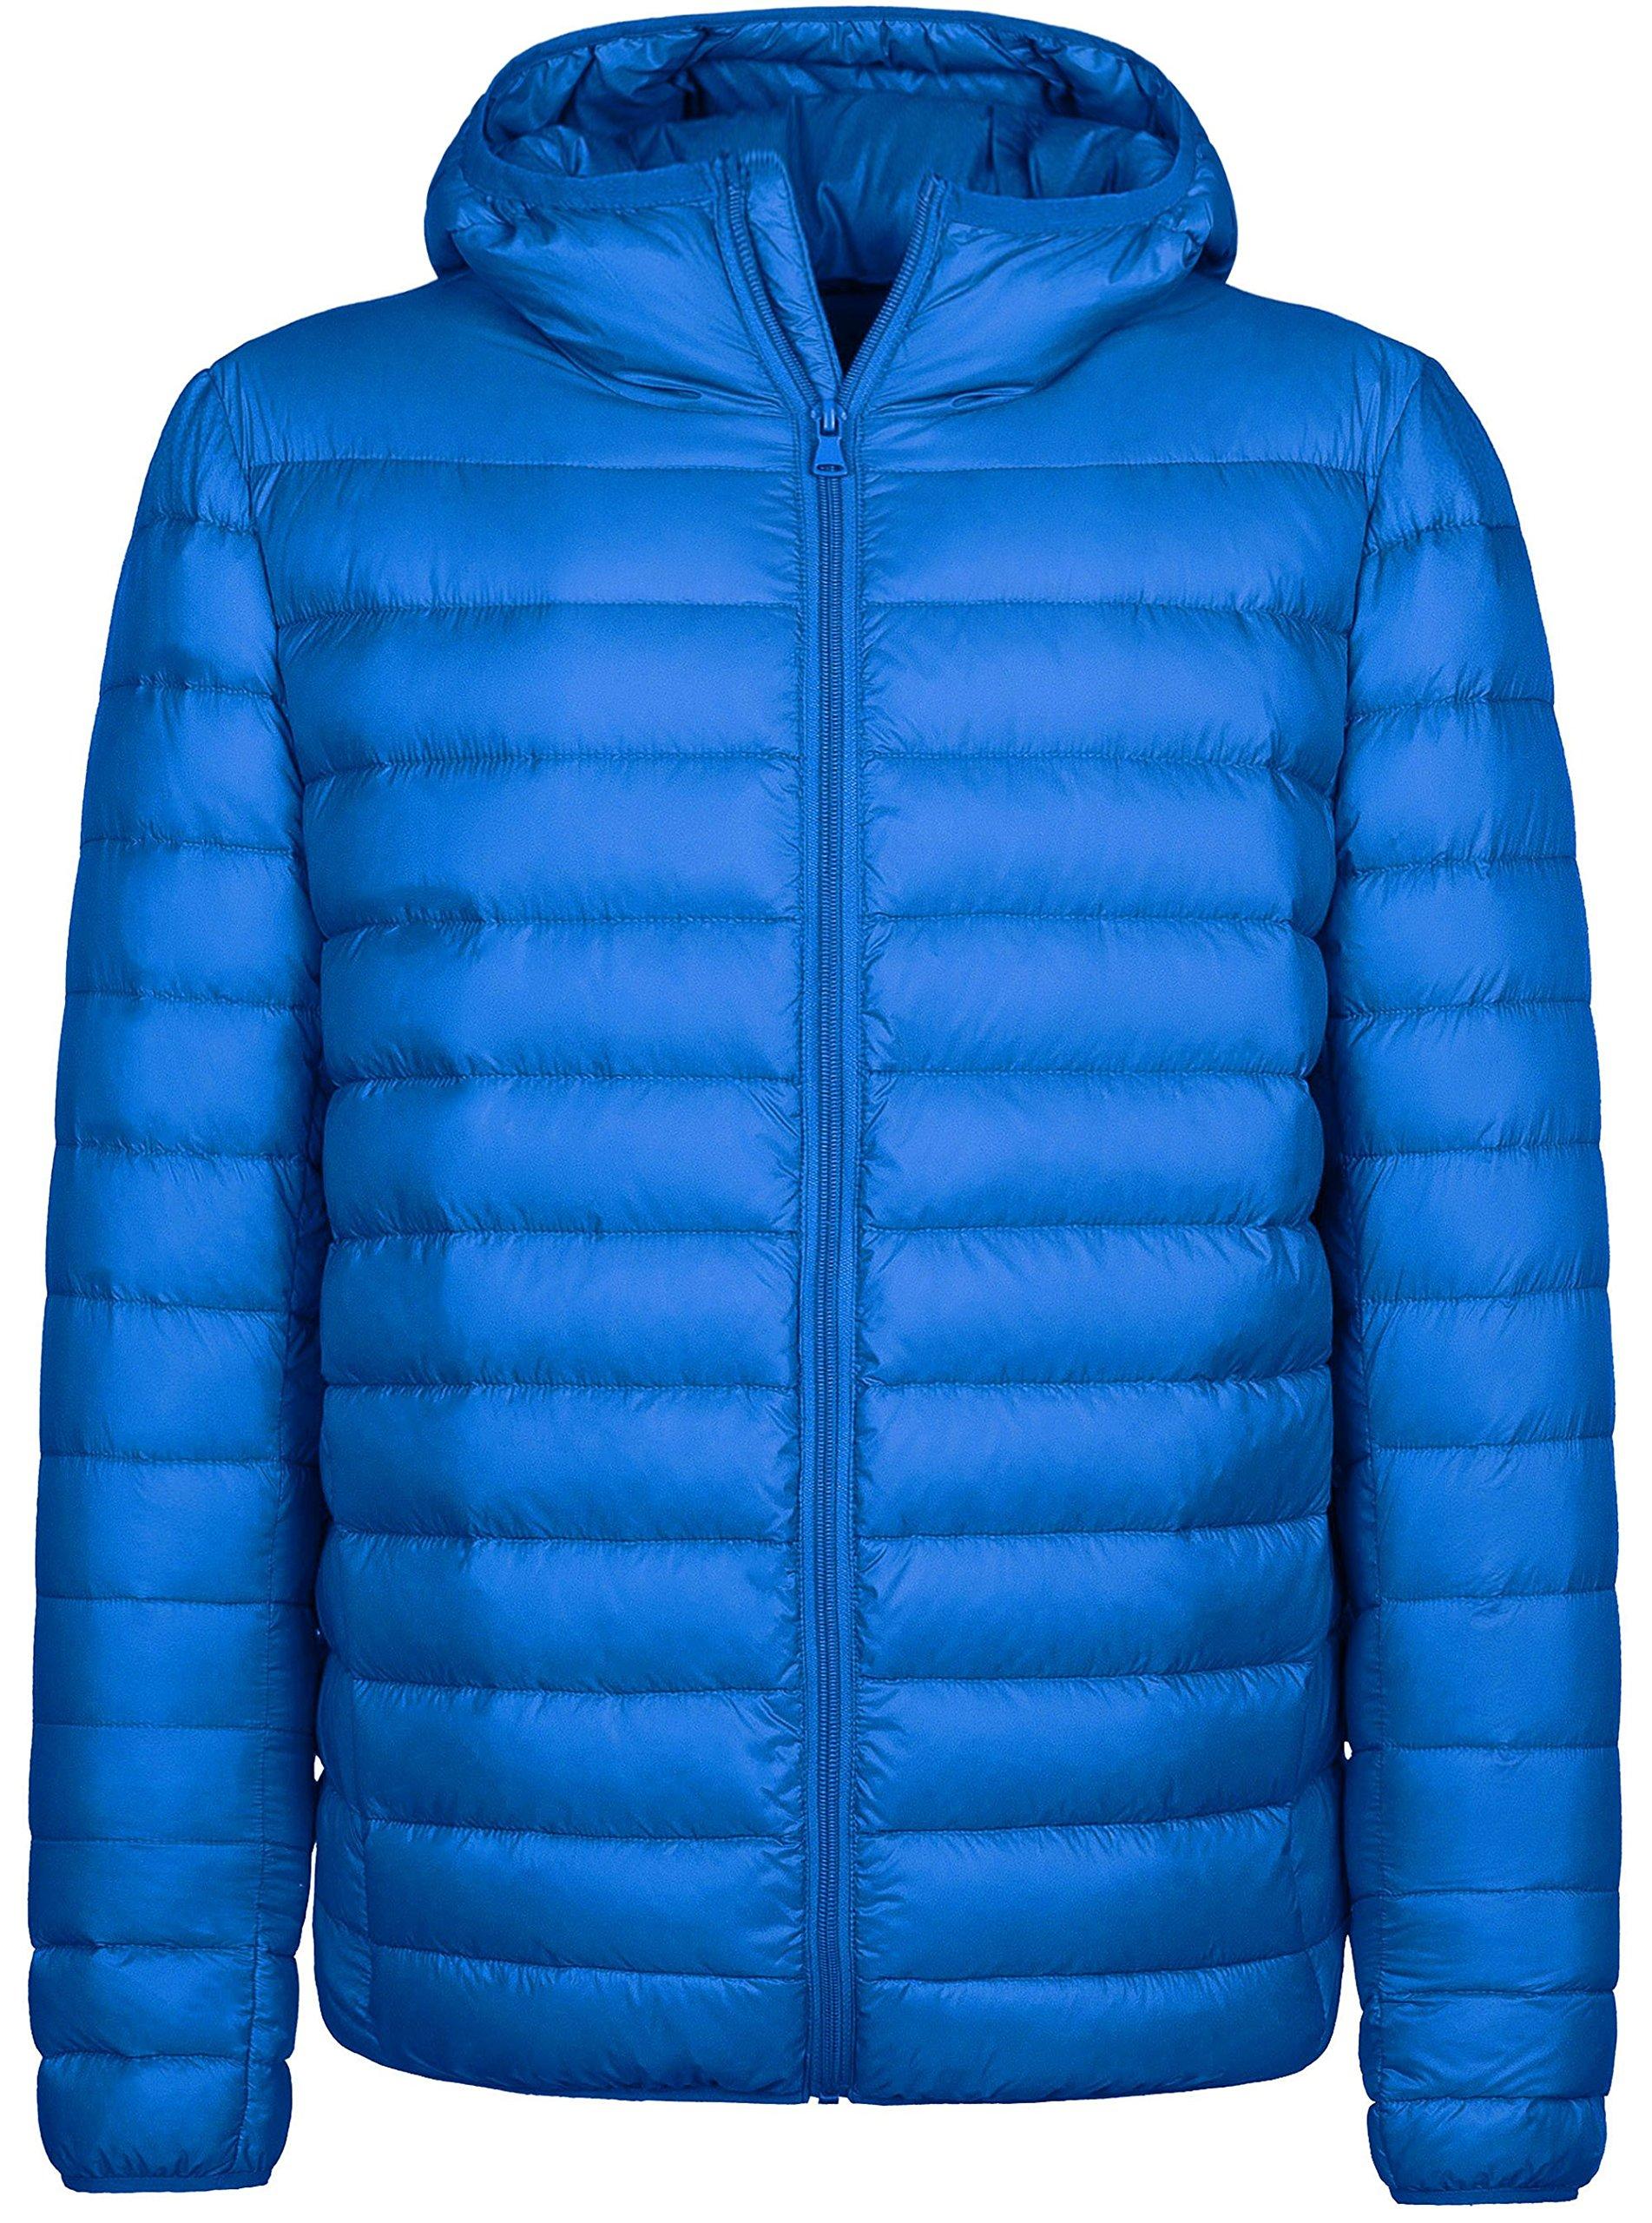 Wantdo Men's Hooded Packable Light Weight Down Jacket Small Sapphire Blue